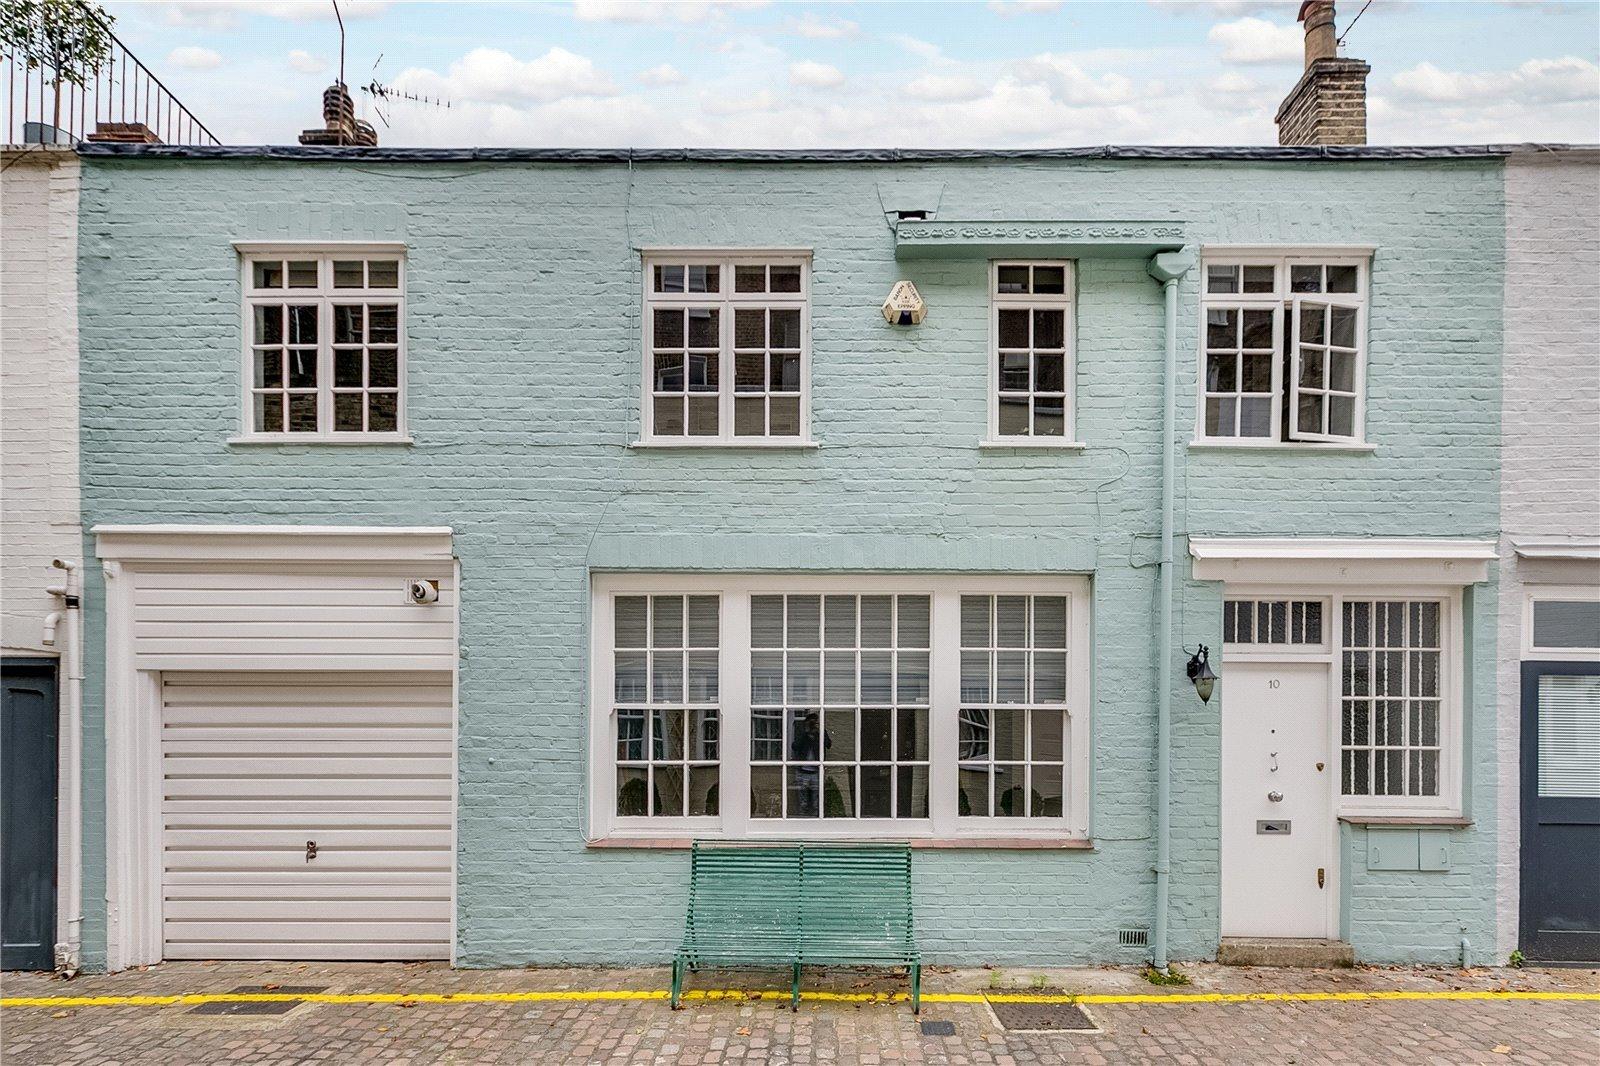 Victoria Grove Mews, Notting Hill, London, RBKC, W2-9